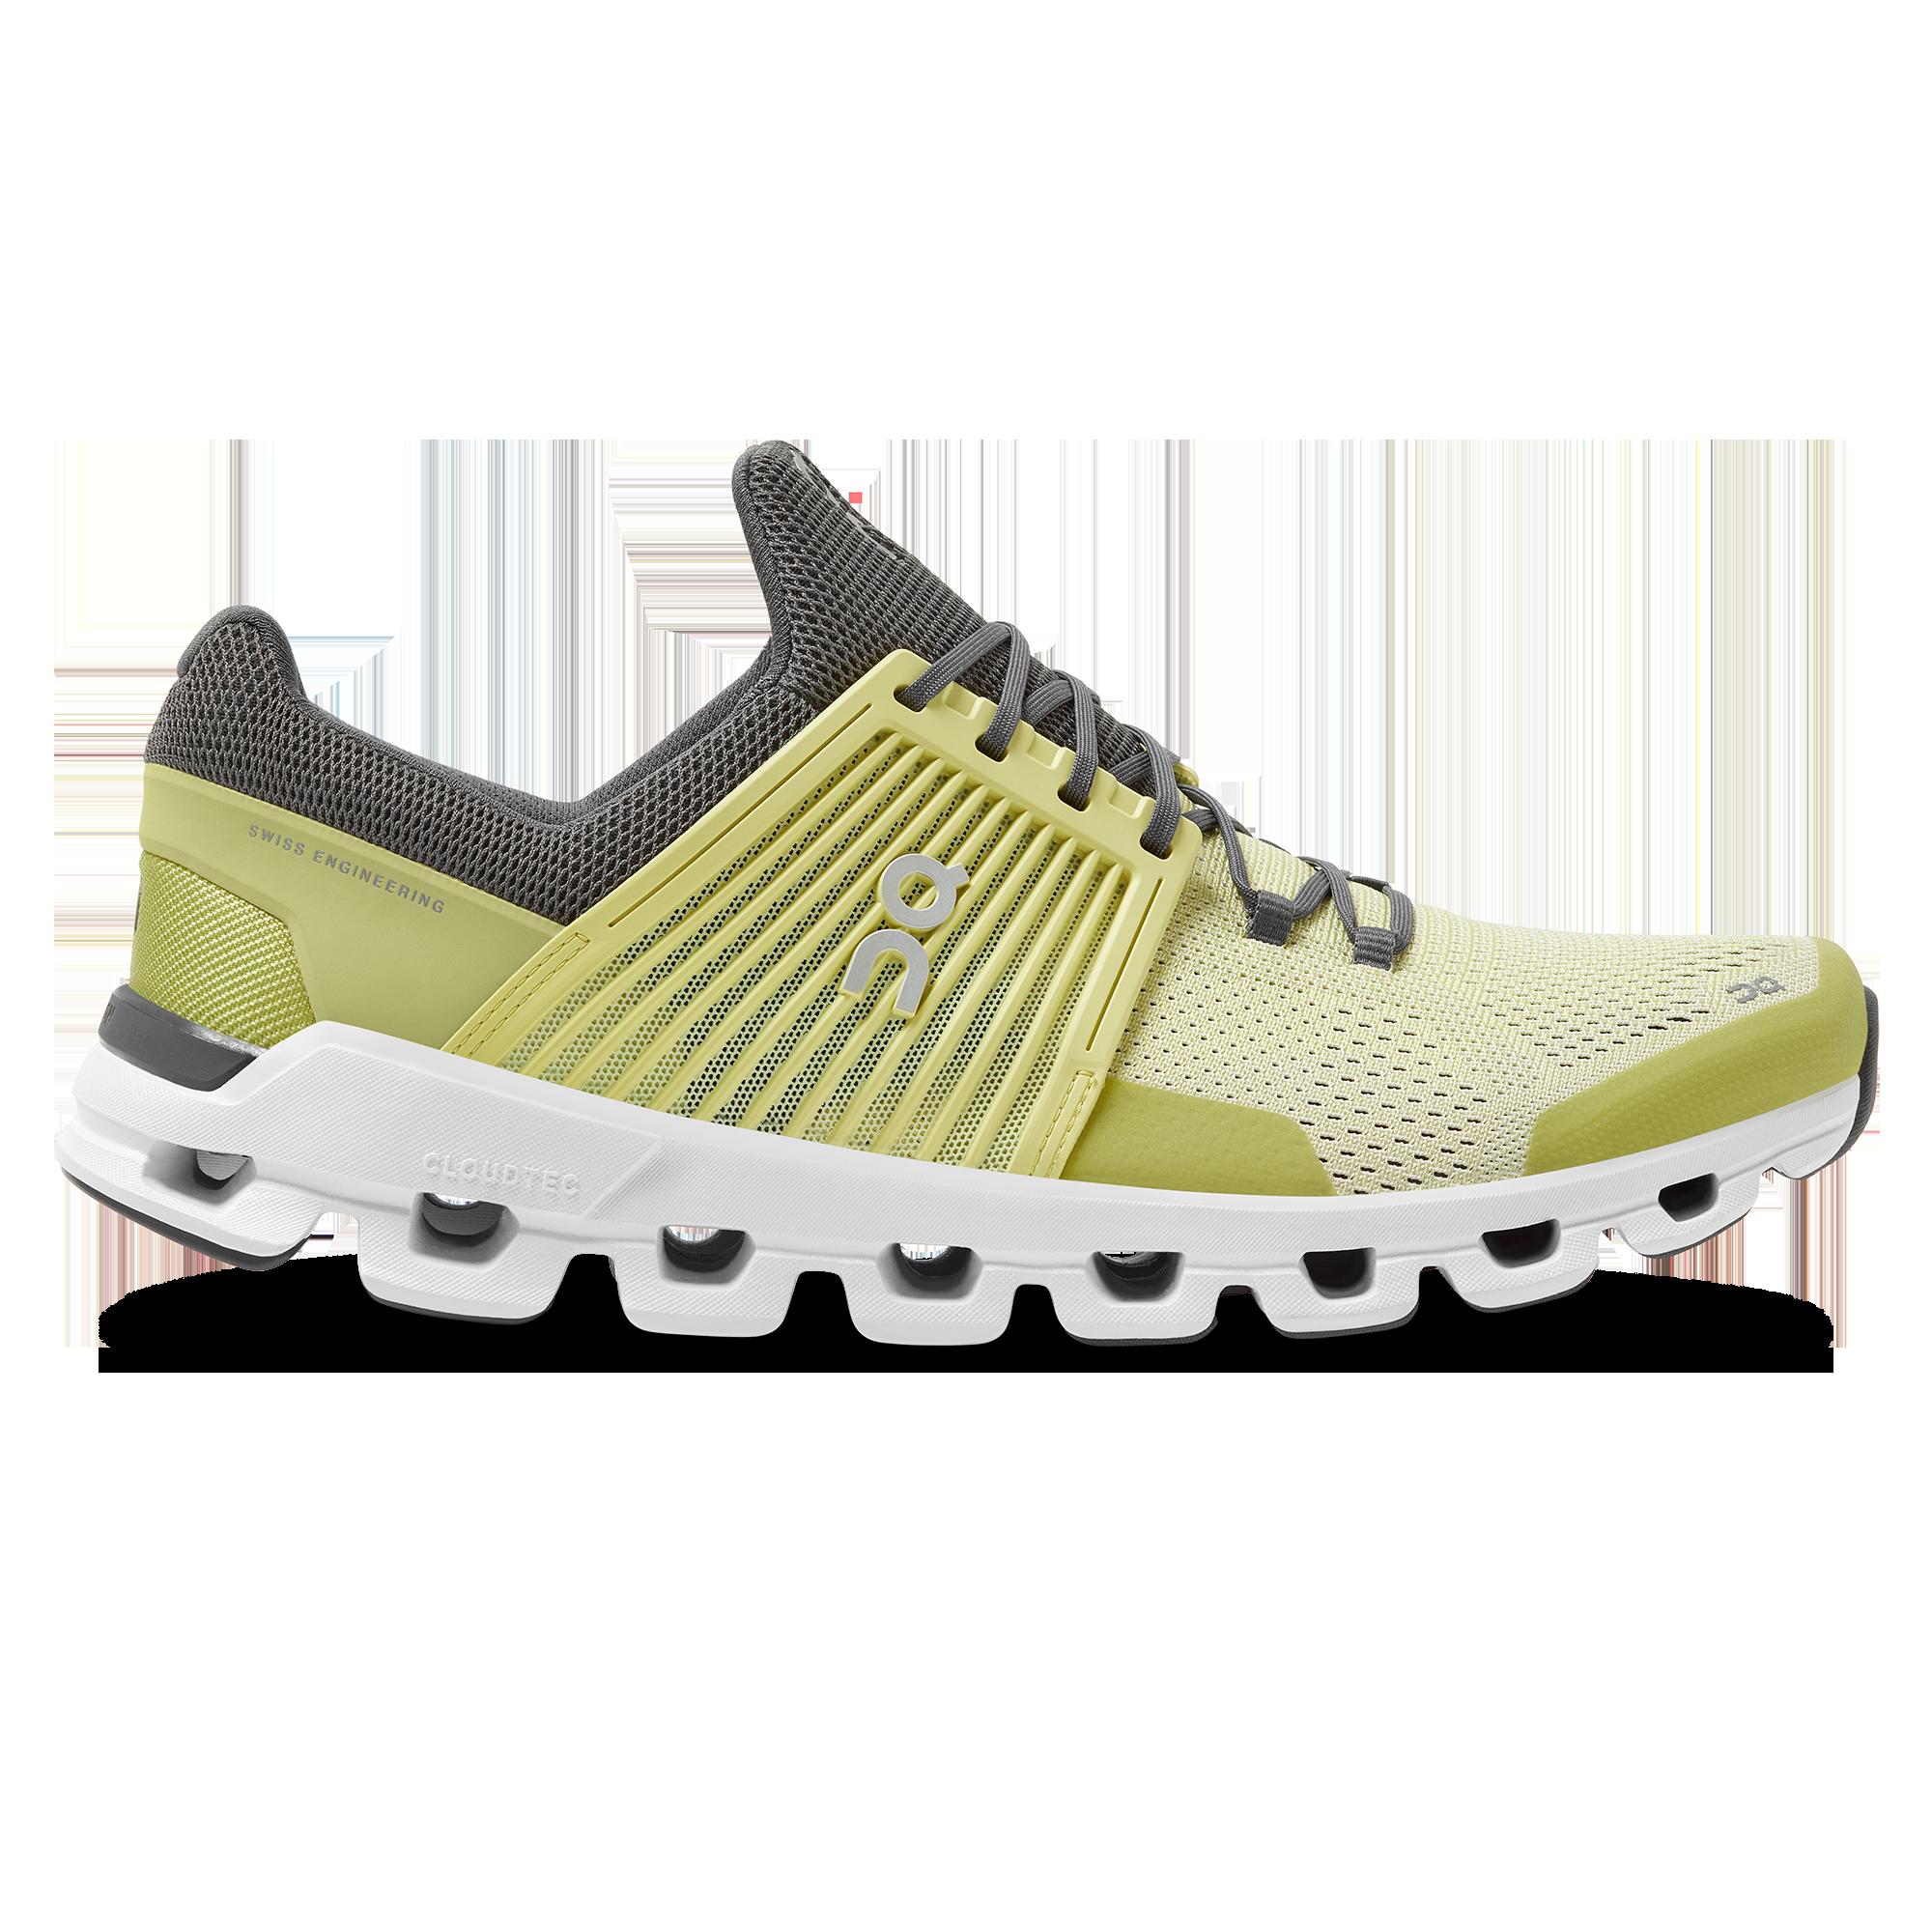 Shoe For Urban Running